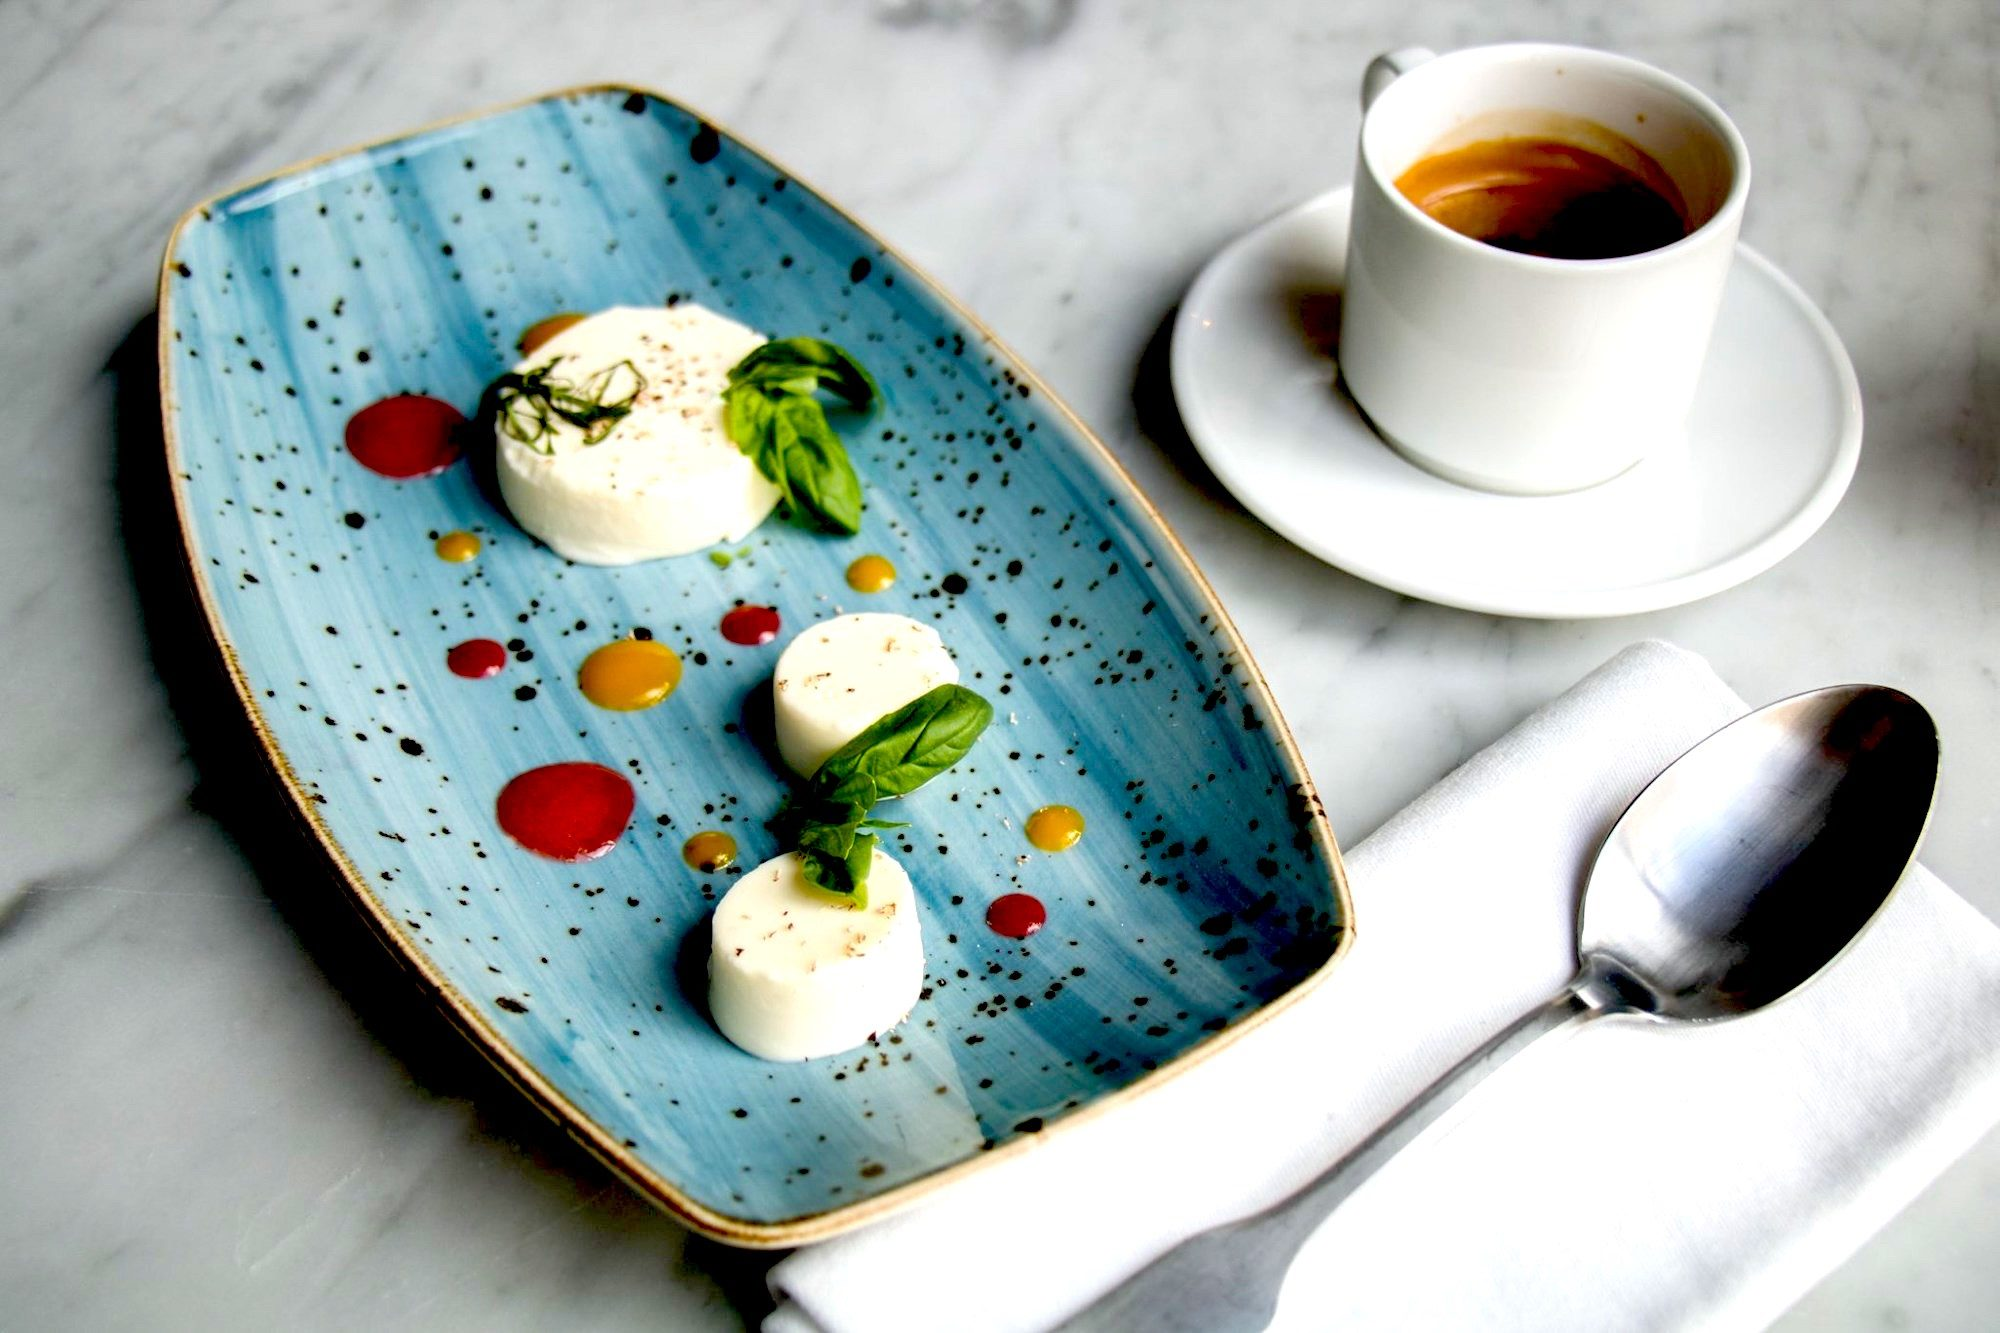 Dessert and coffee at Le Relais restaurant in Paris.